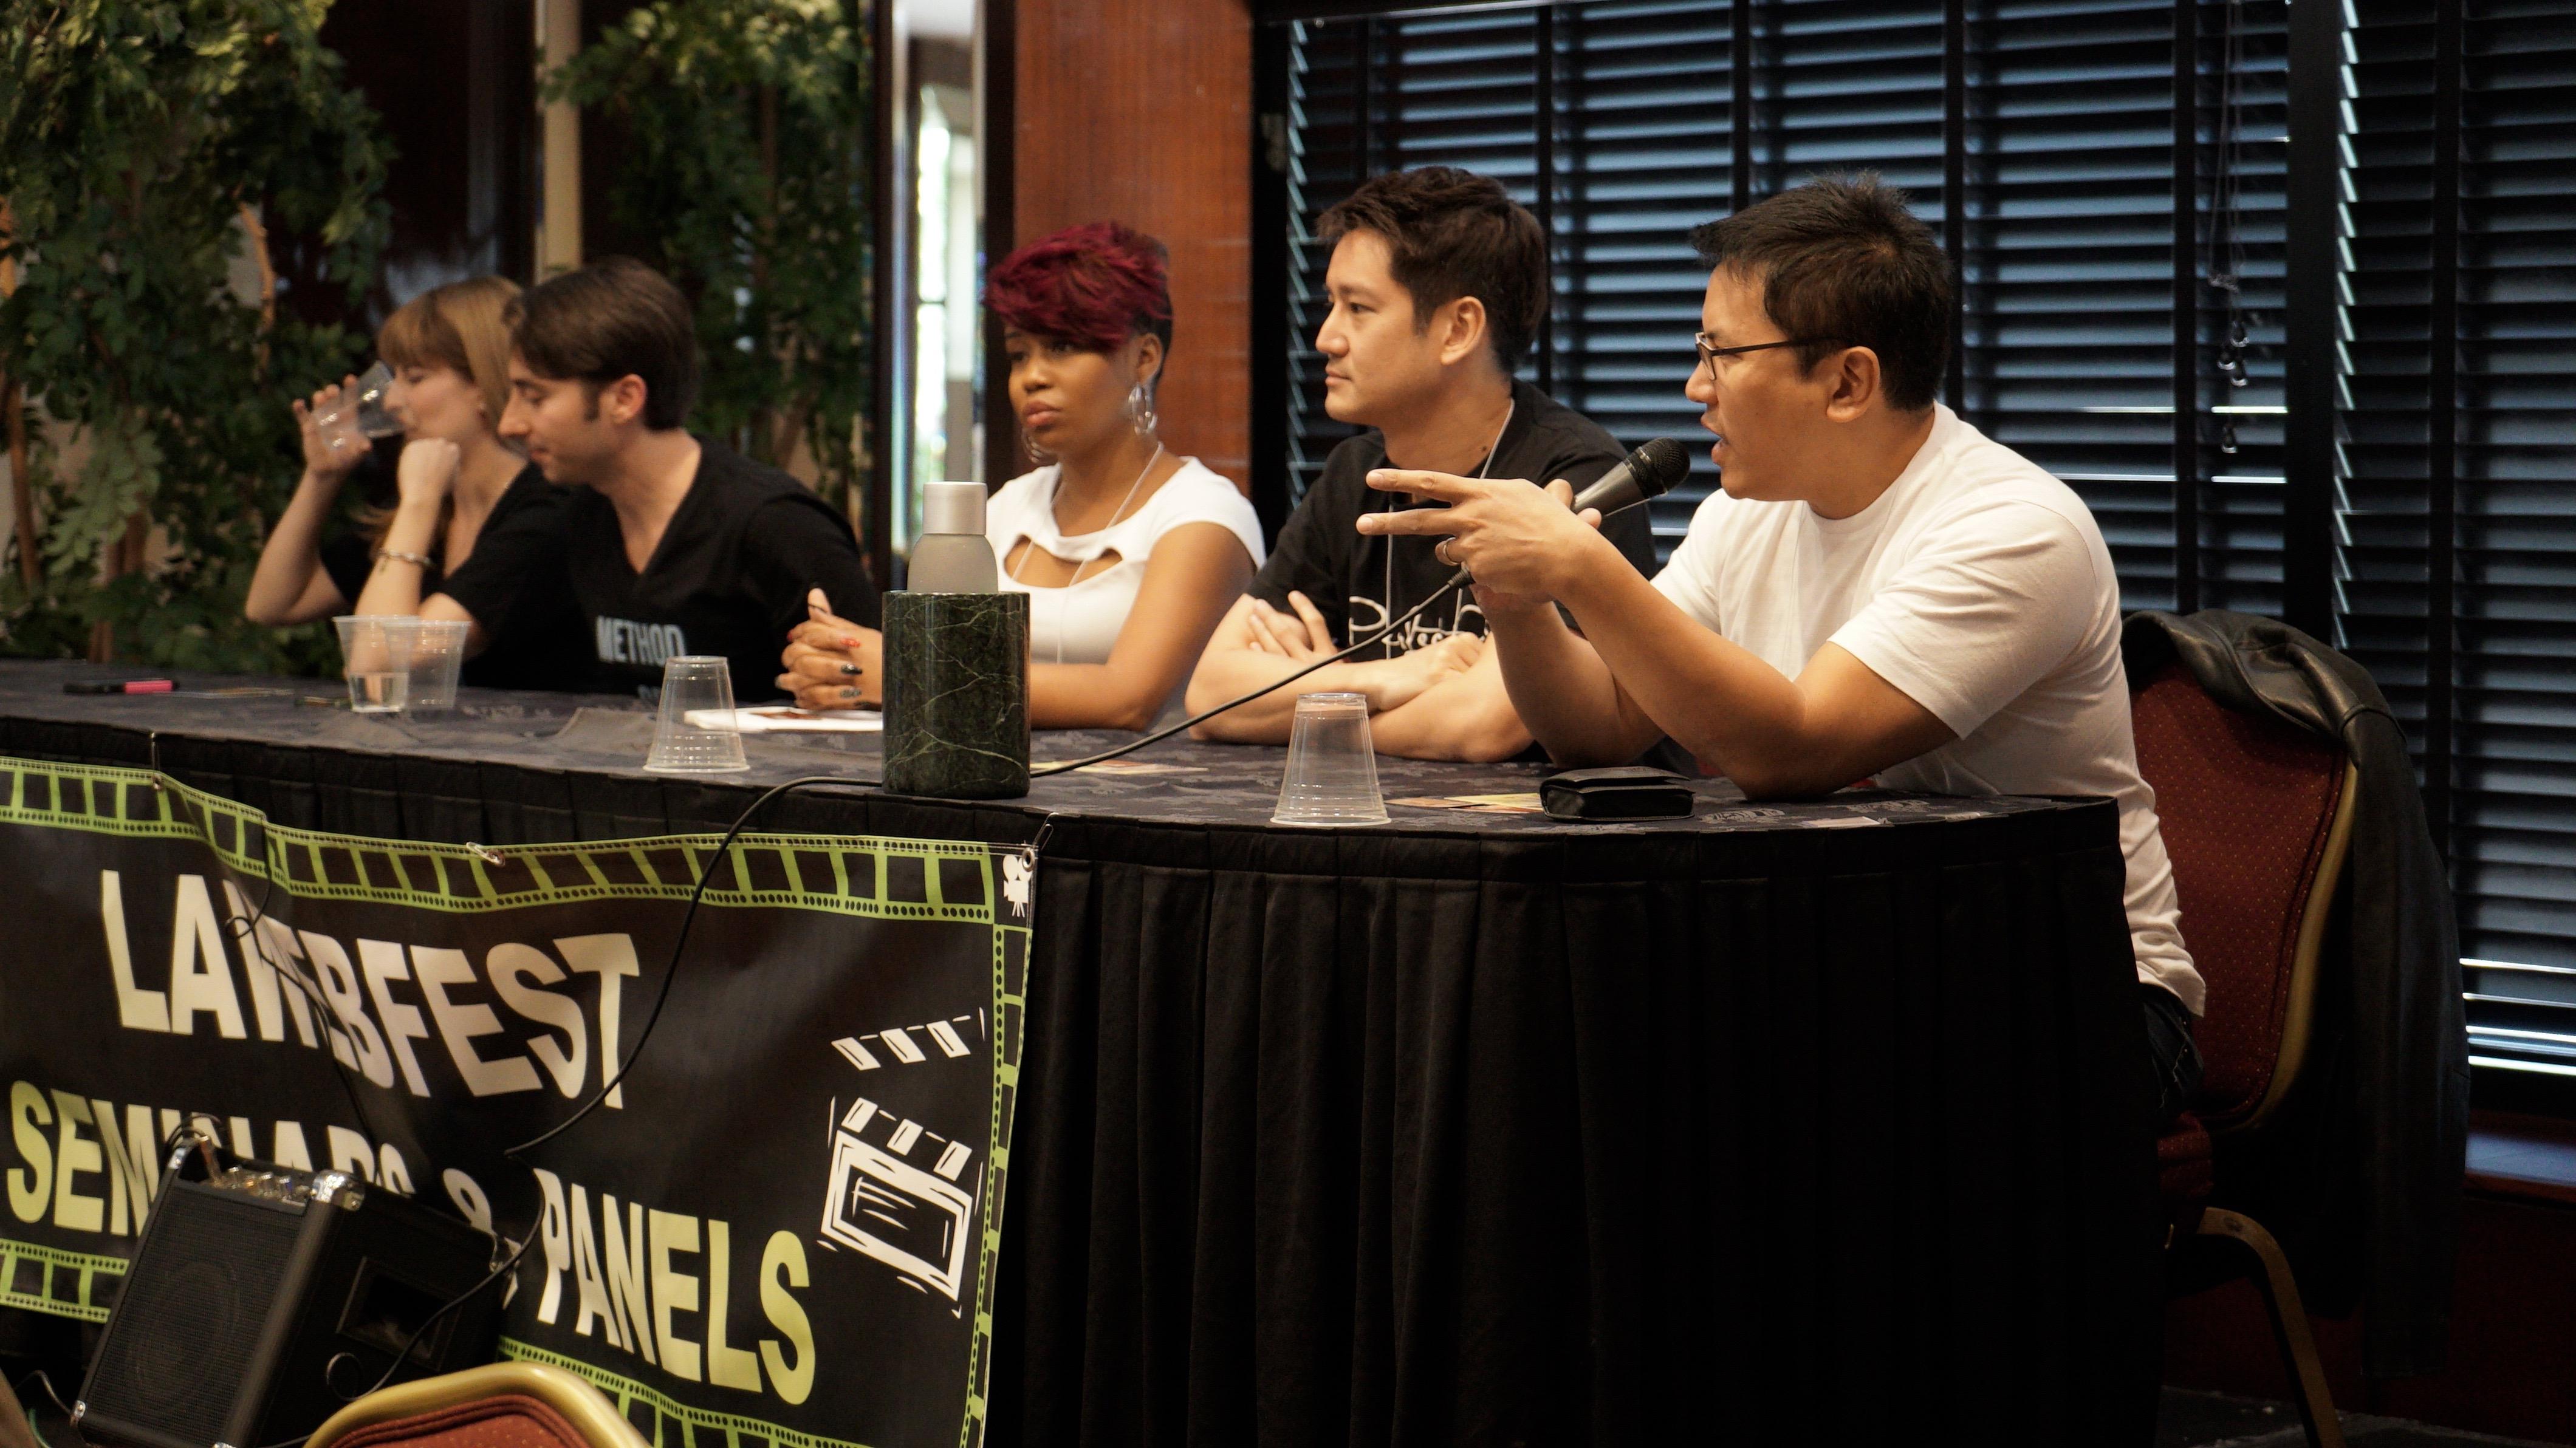 Speaking on a panel at LA Webfest 2015